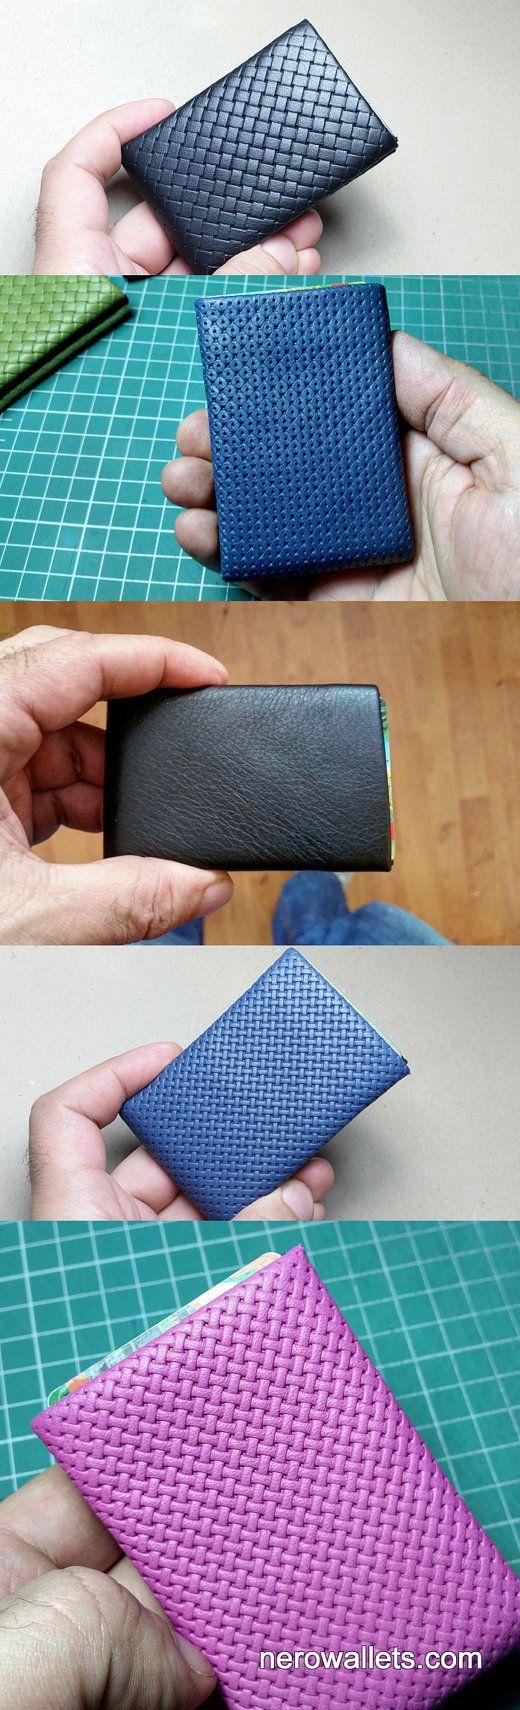 Limited Edition NERO Wallet BLU Marino Nappa by NeroWallet